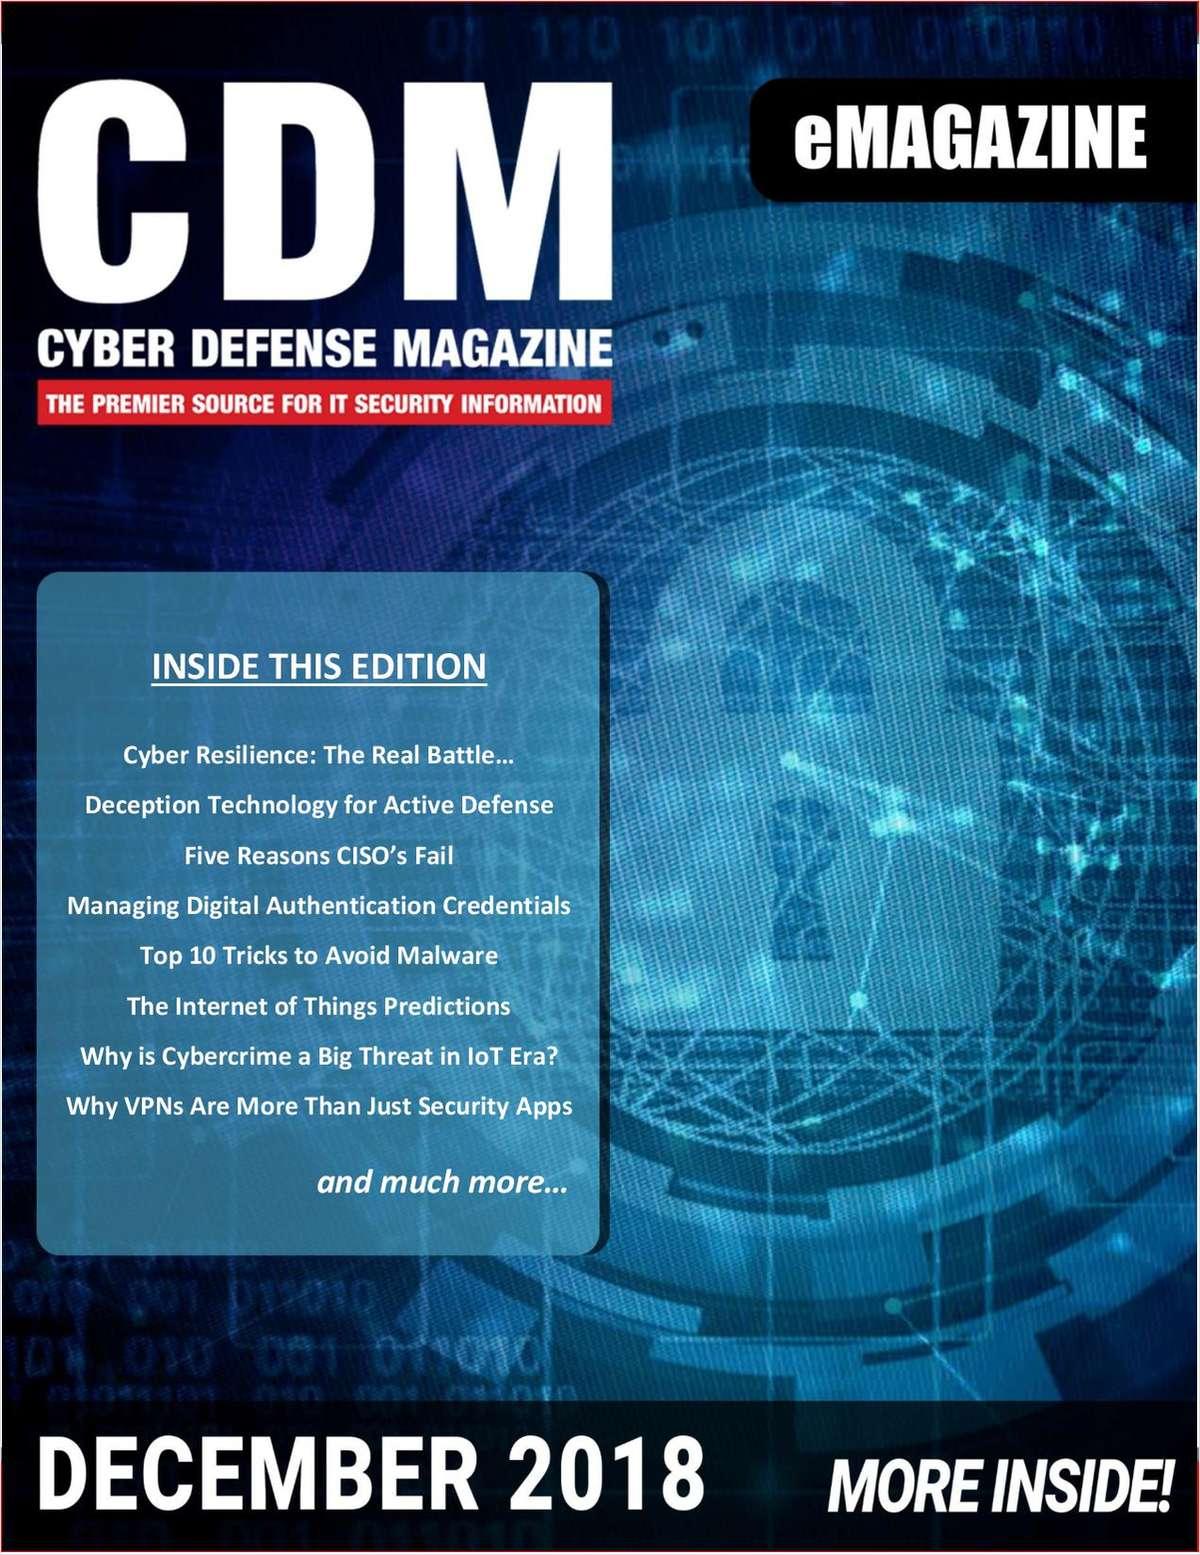 Cyber Defense eMagazine - Top 10 Tricks to Avoid Malware - December 2018 Edition